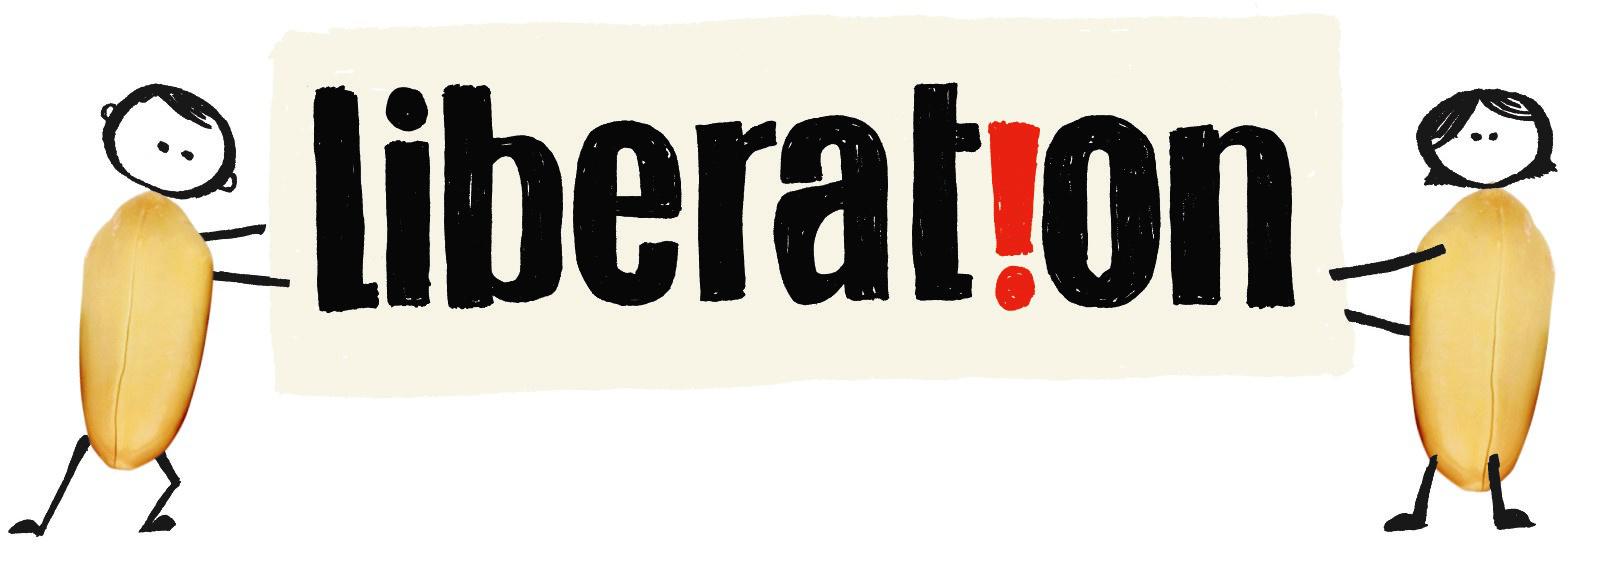 Liberation Foods CIC.jpg.x4dlipp